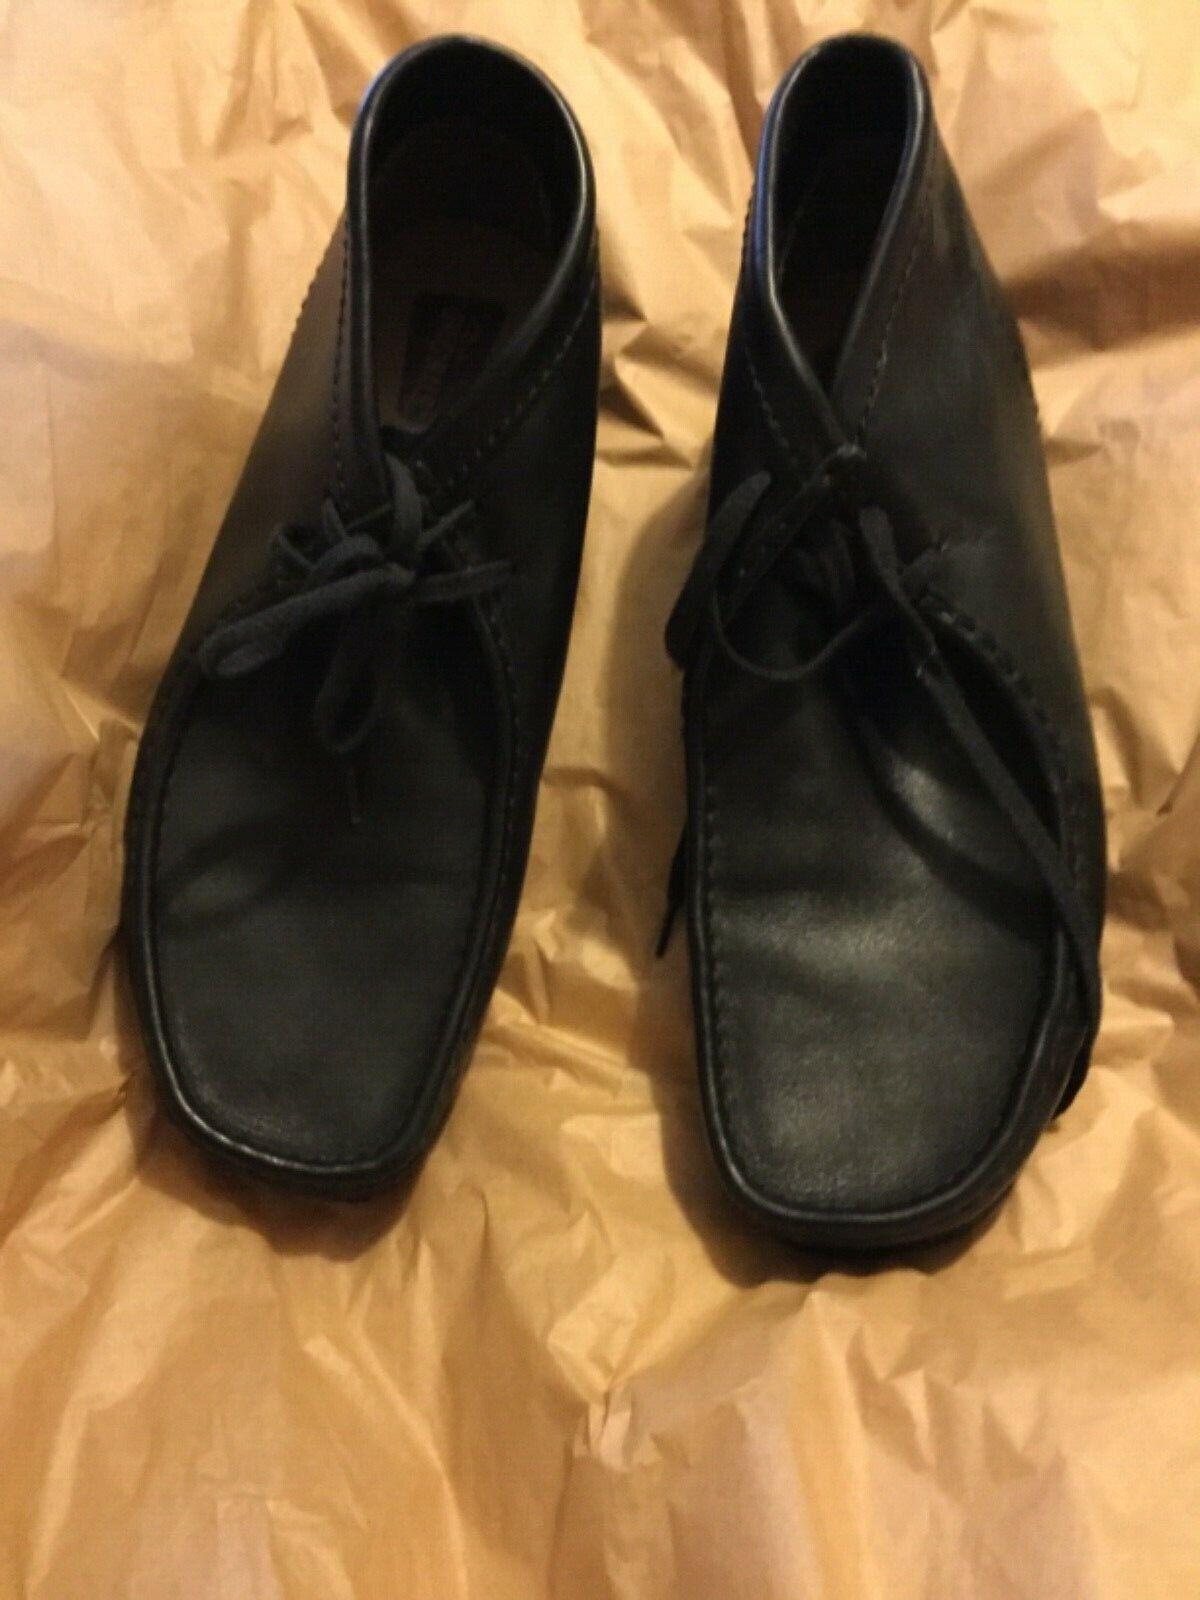 EXC COND Clarks Originals Wallabee Men's Black Leather Crepe Sole Oxfords - 12